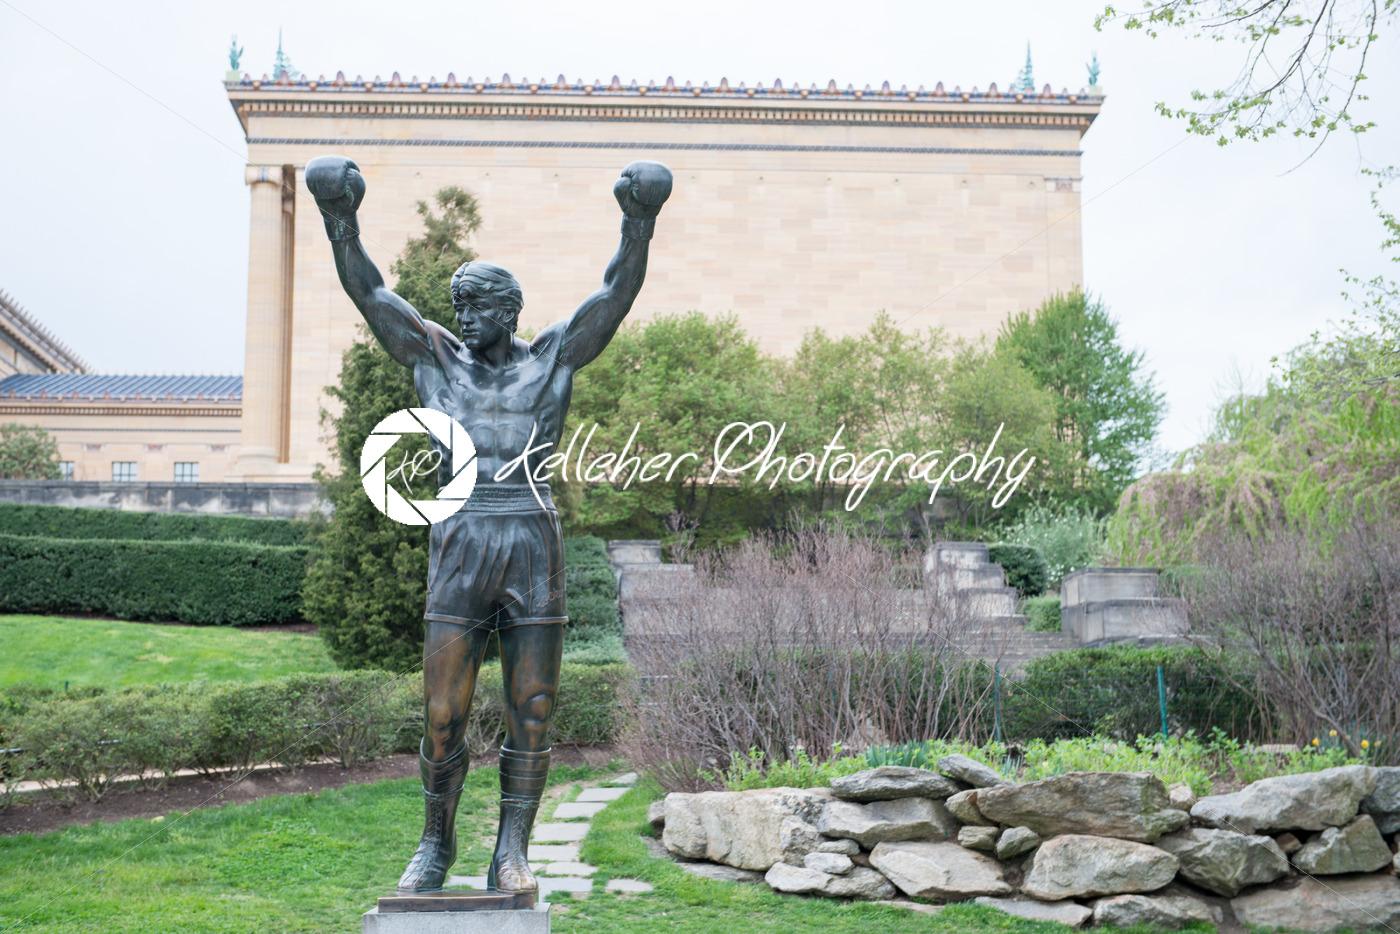 PHILADELPHIA, PA – APRIL 19: The Rocky Statue outside of the Philadelphia Museum of Art on April 19, 2013 - Kelleher Photography Store